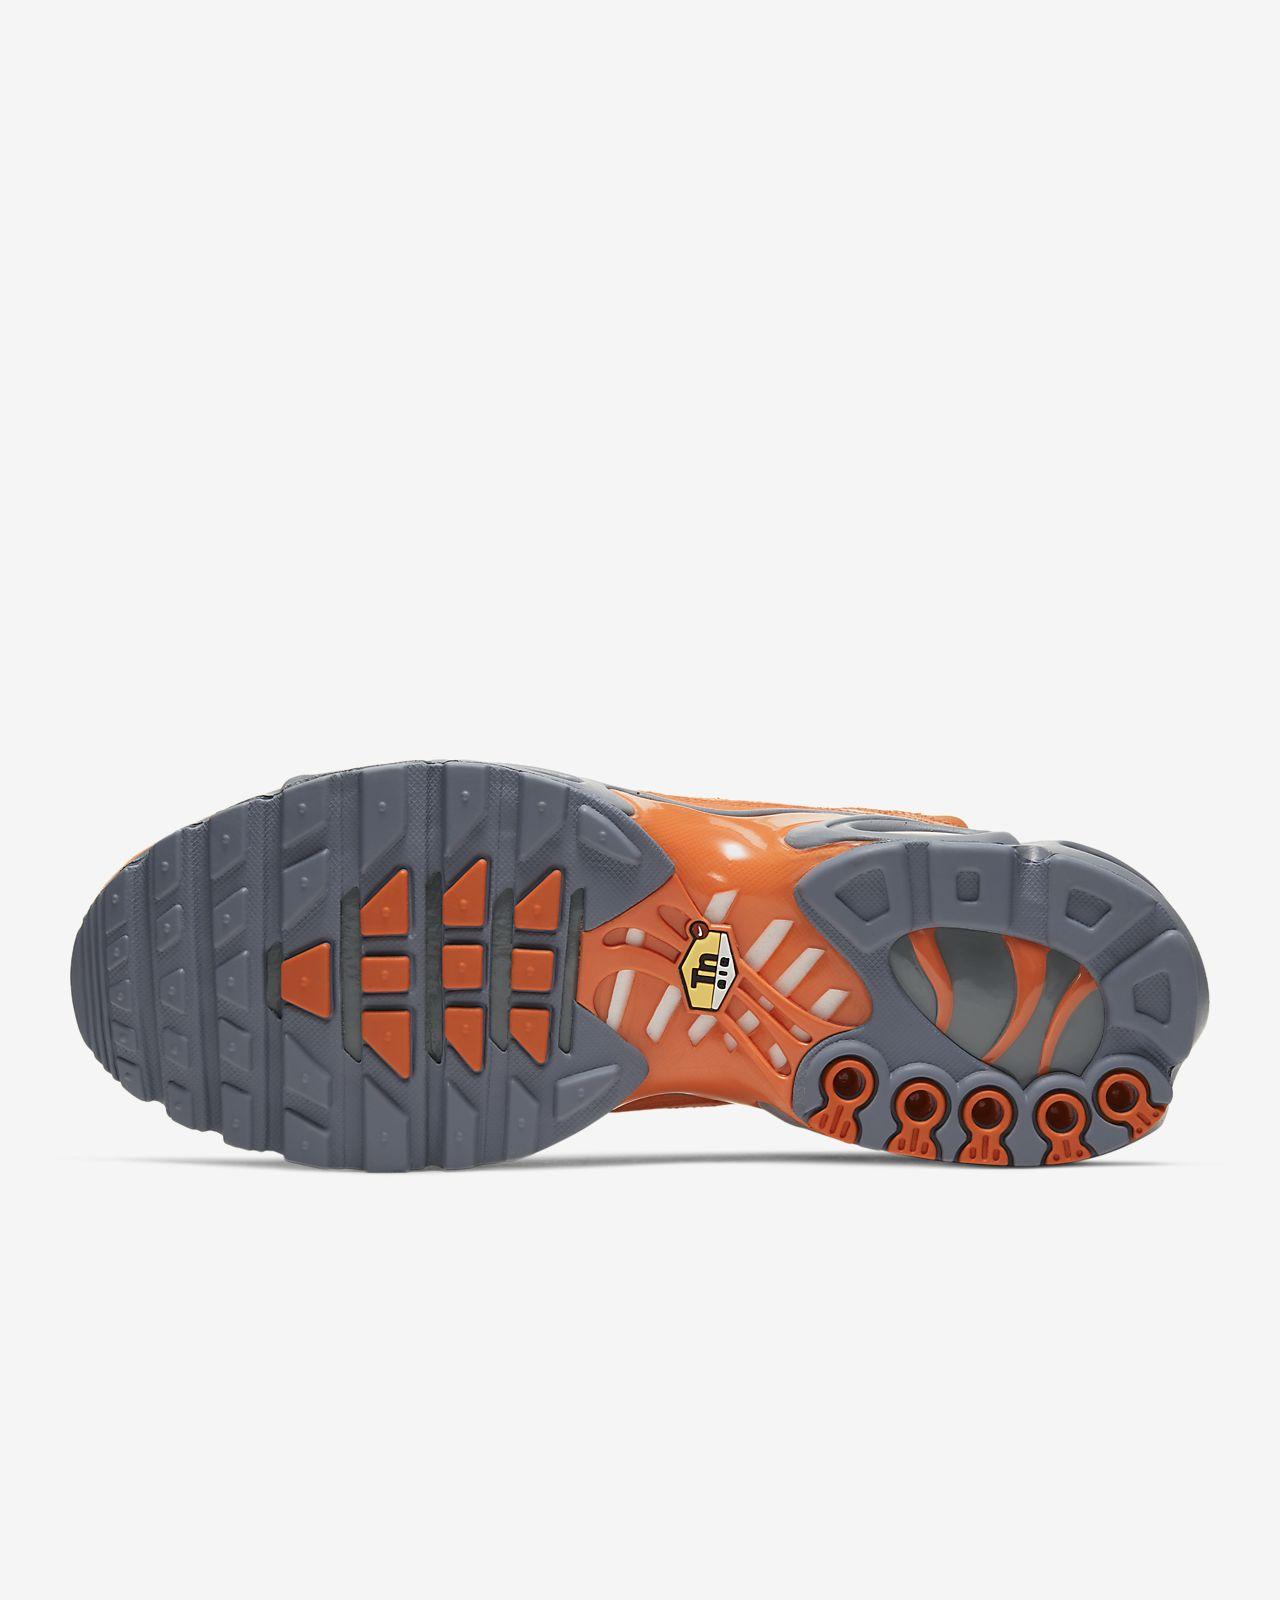 Nike Air Max Plus Deconstructed Men's Shoe